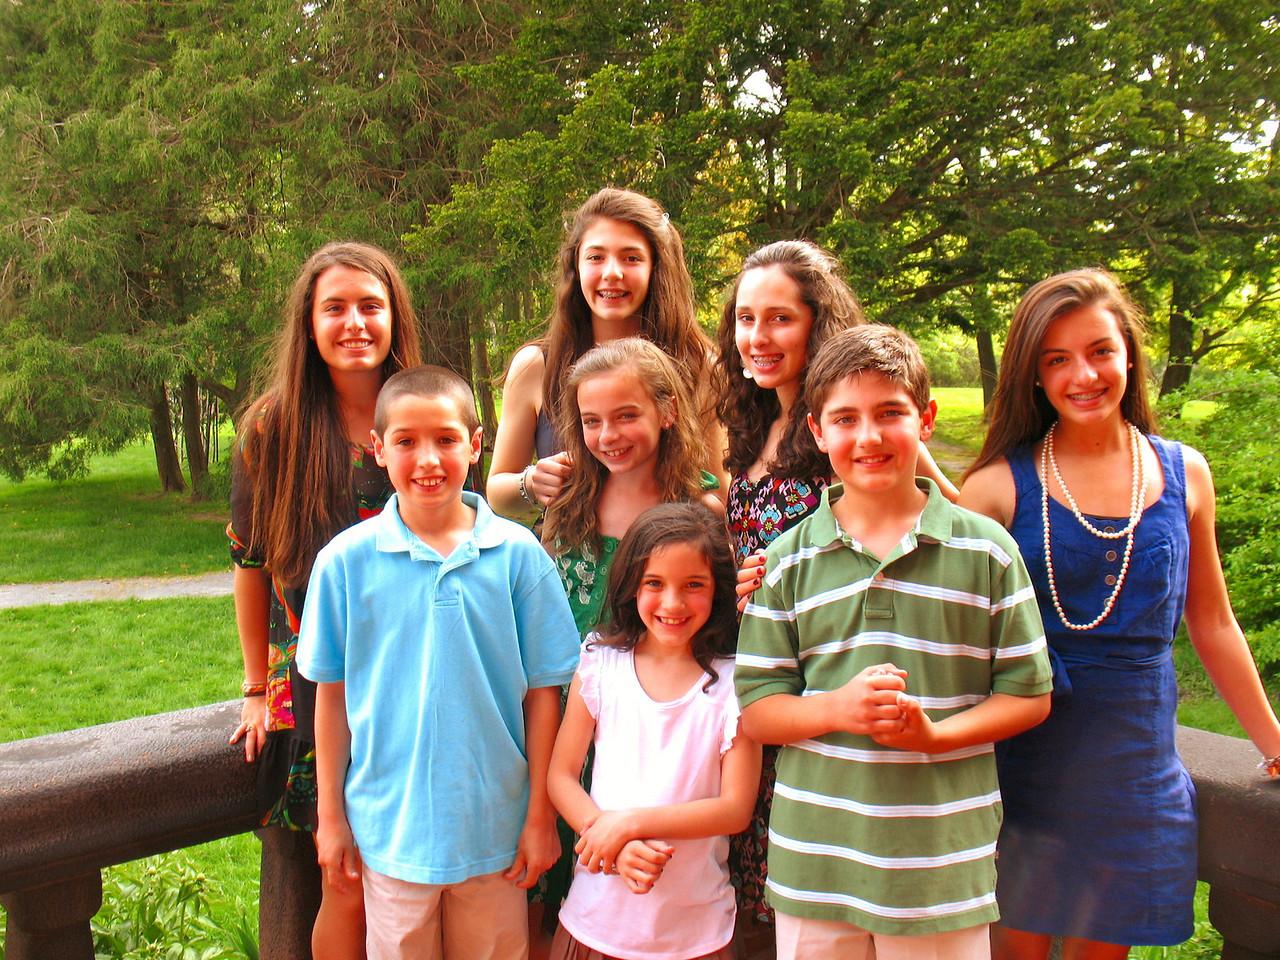 Ali, Tommy, Talia, Emma, Genna, Marisa, Nick, and Julia.